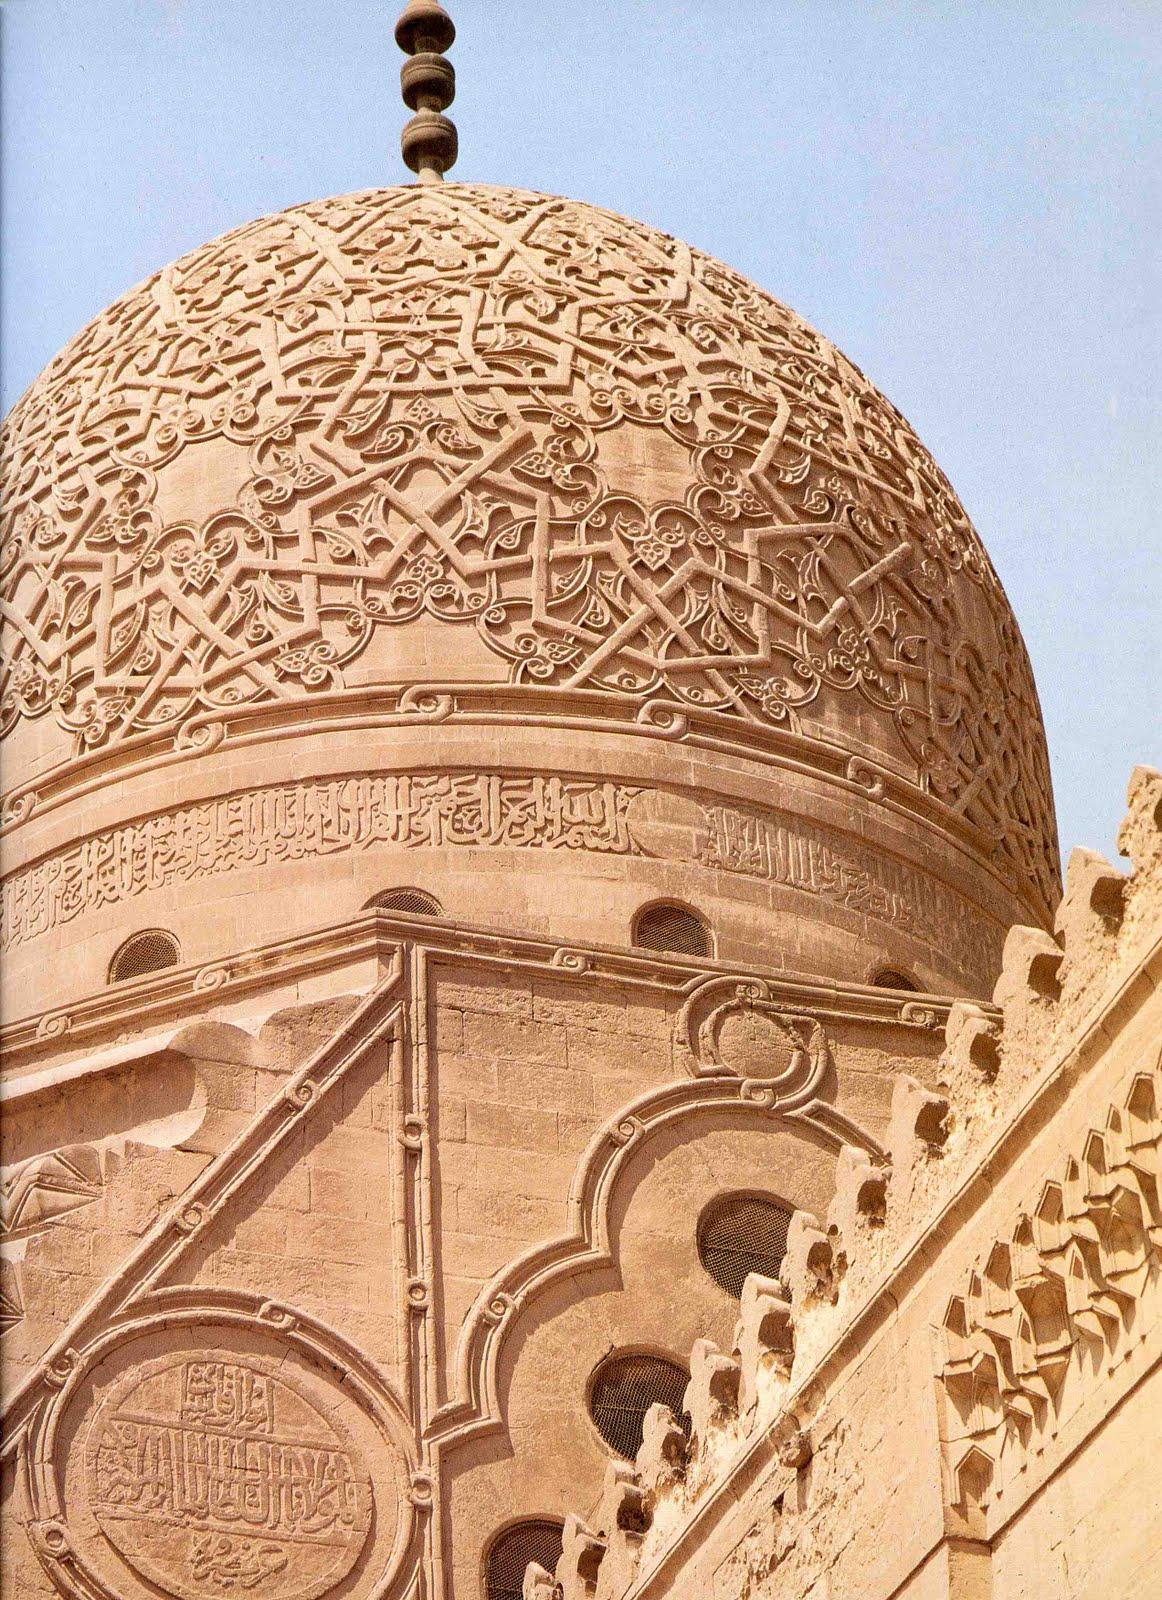 Medioevo y renacimiento arquitectura isl mica for Arquitectura islamica